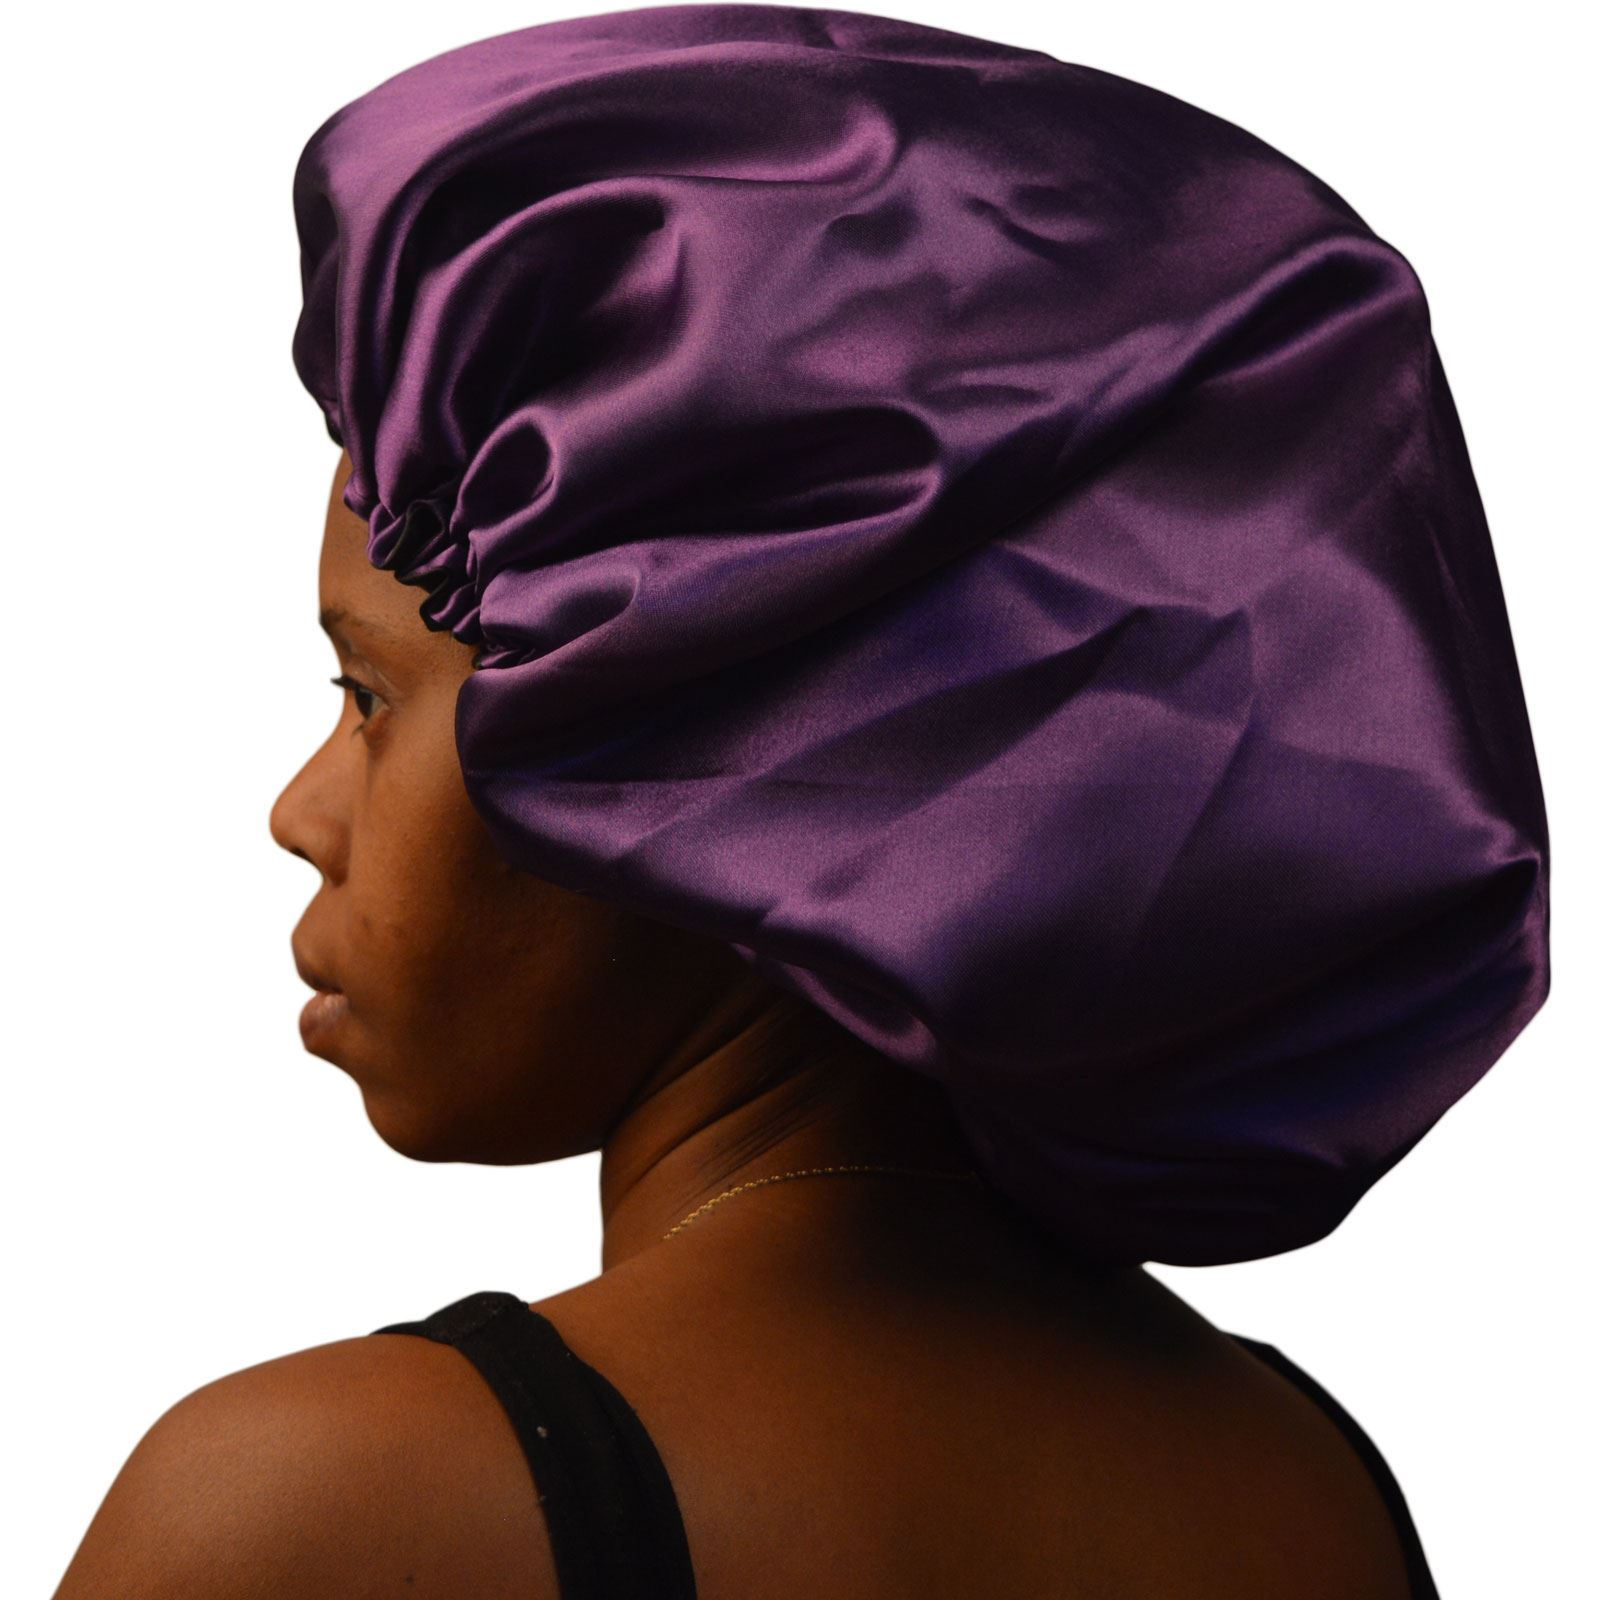 Bild av Sovmössa satin bonnet